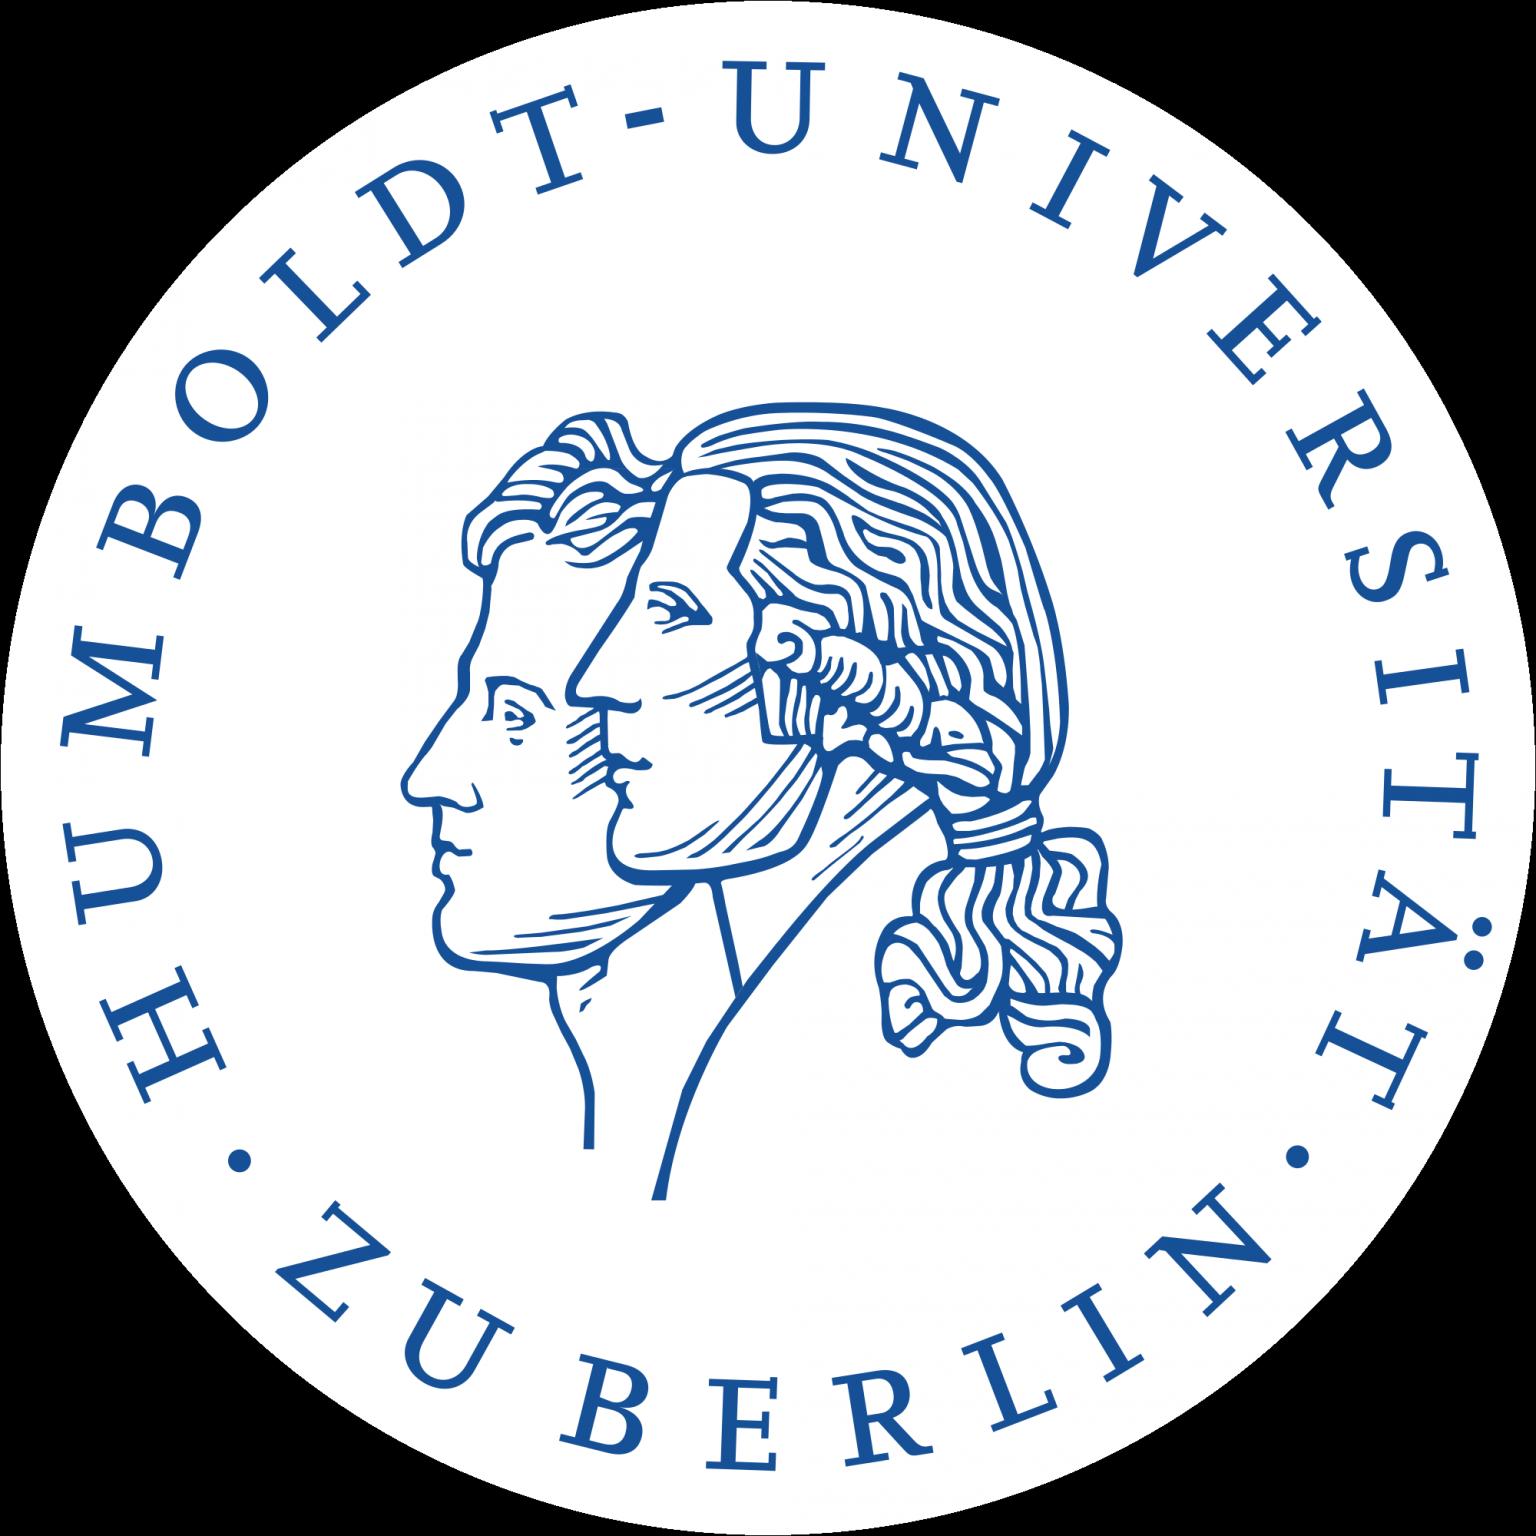 Humboldt Universität